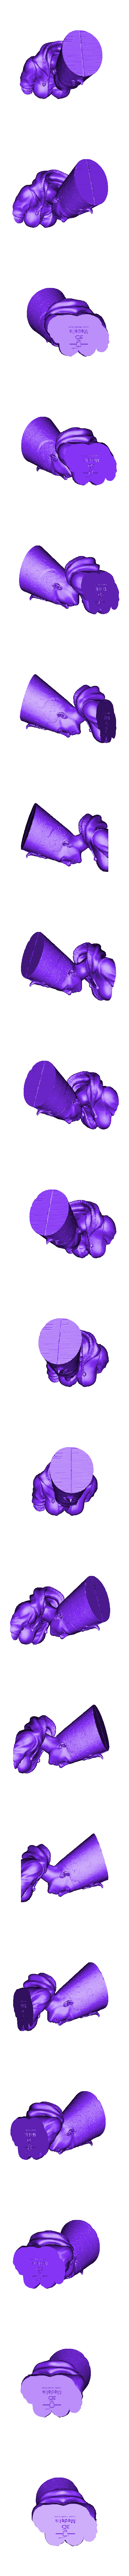 21_nefertiti.stl Download free STL file 21st Century Nefertiti Bust • Model to 3D print, Boris3dStudio